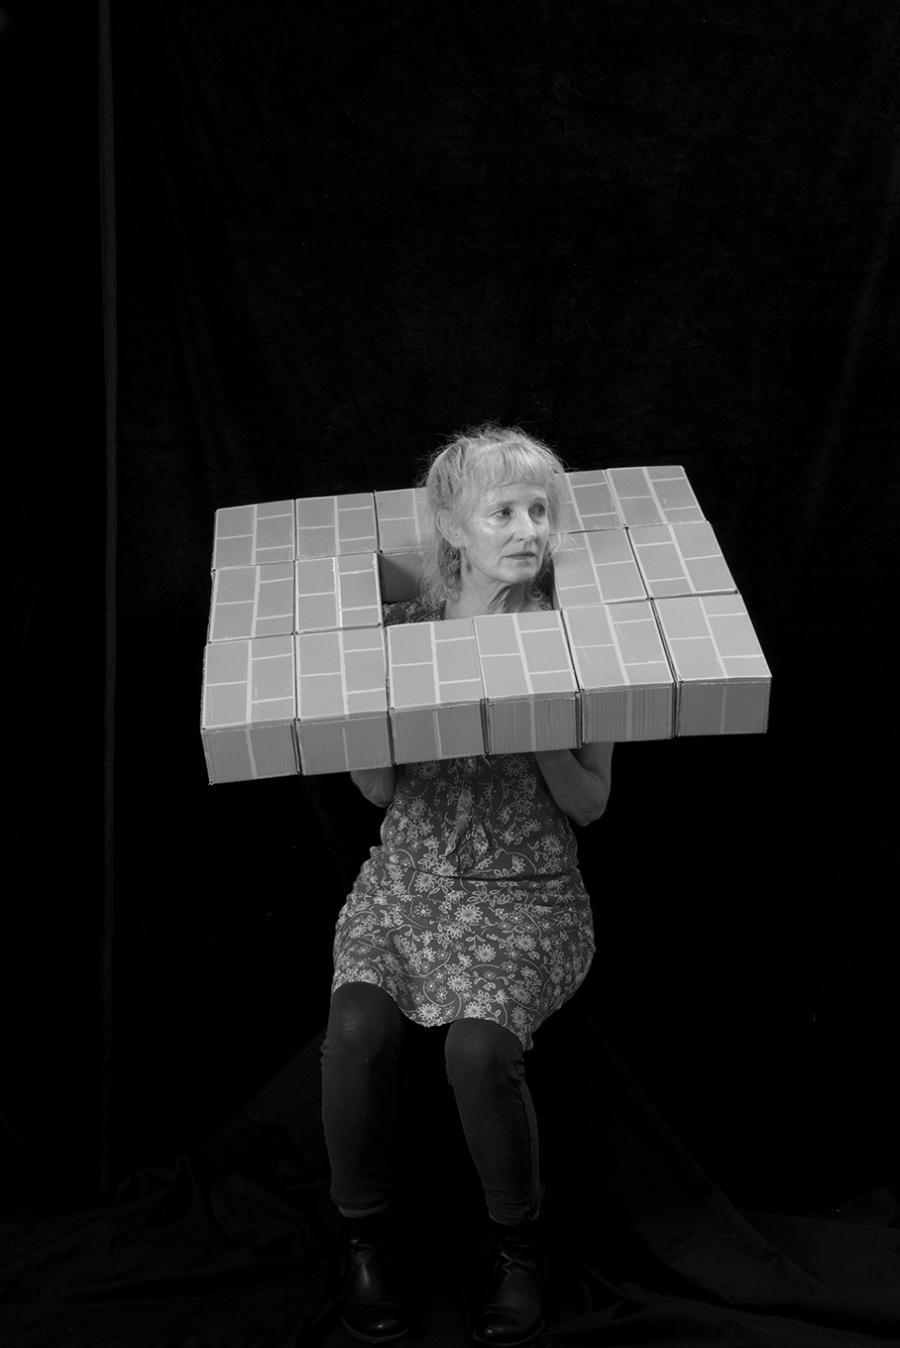 A Brick Hole